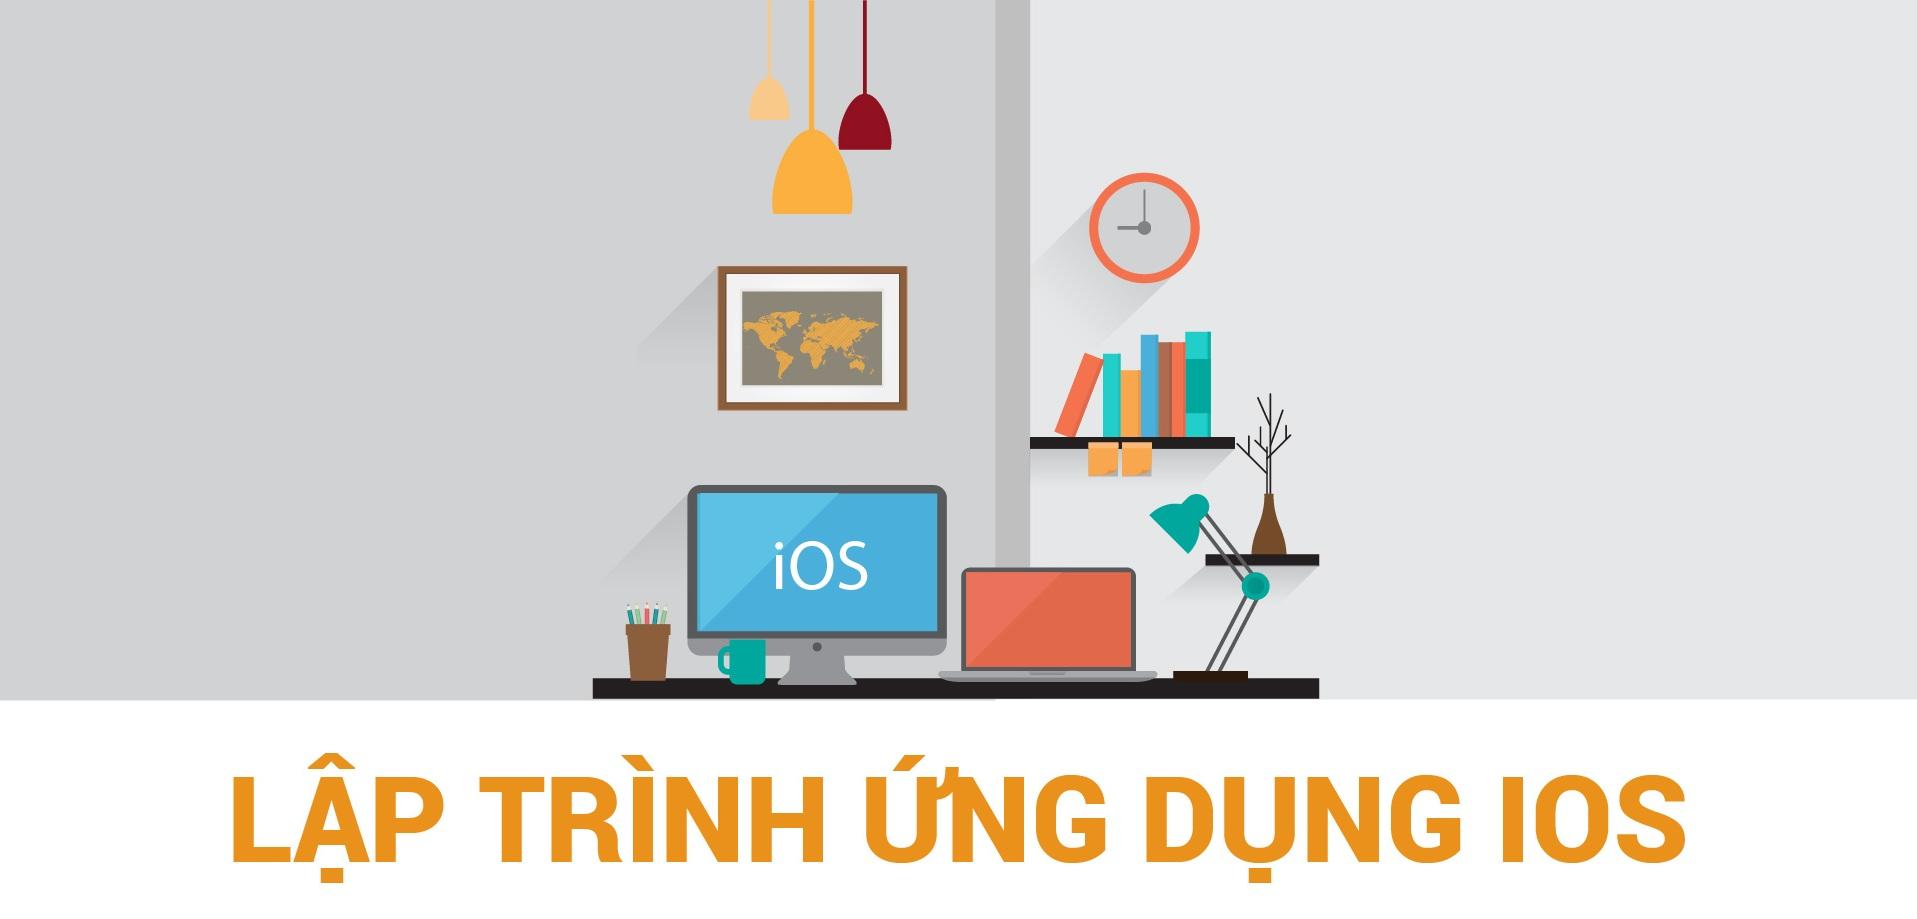 lap-trinh-ung-dung-ios